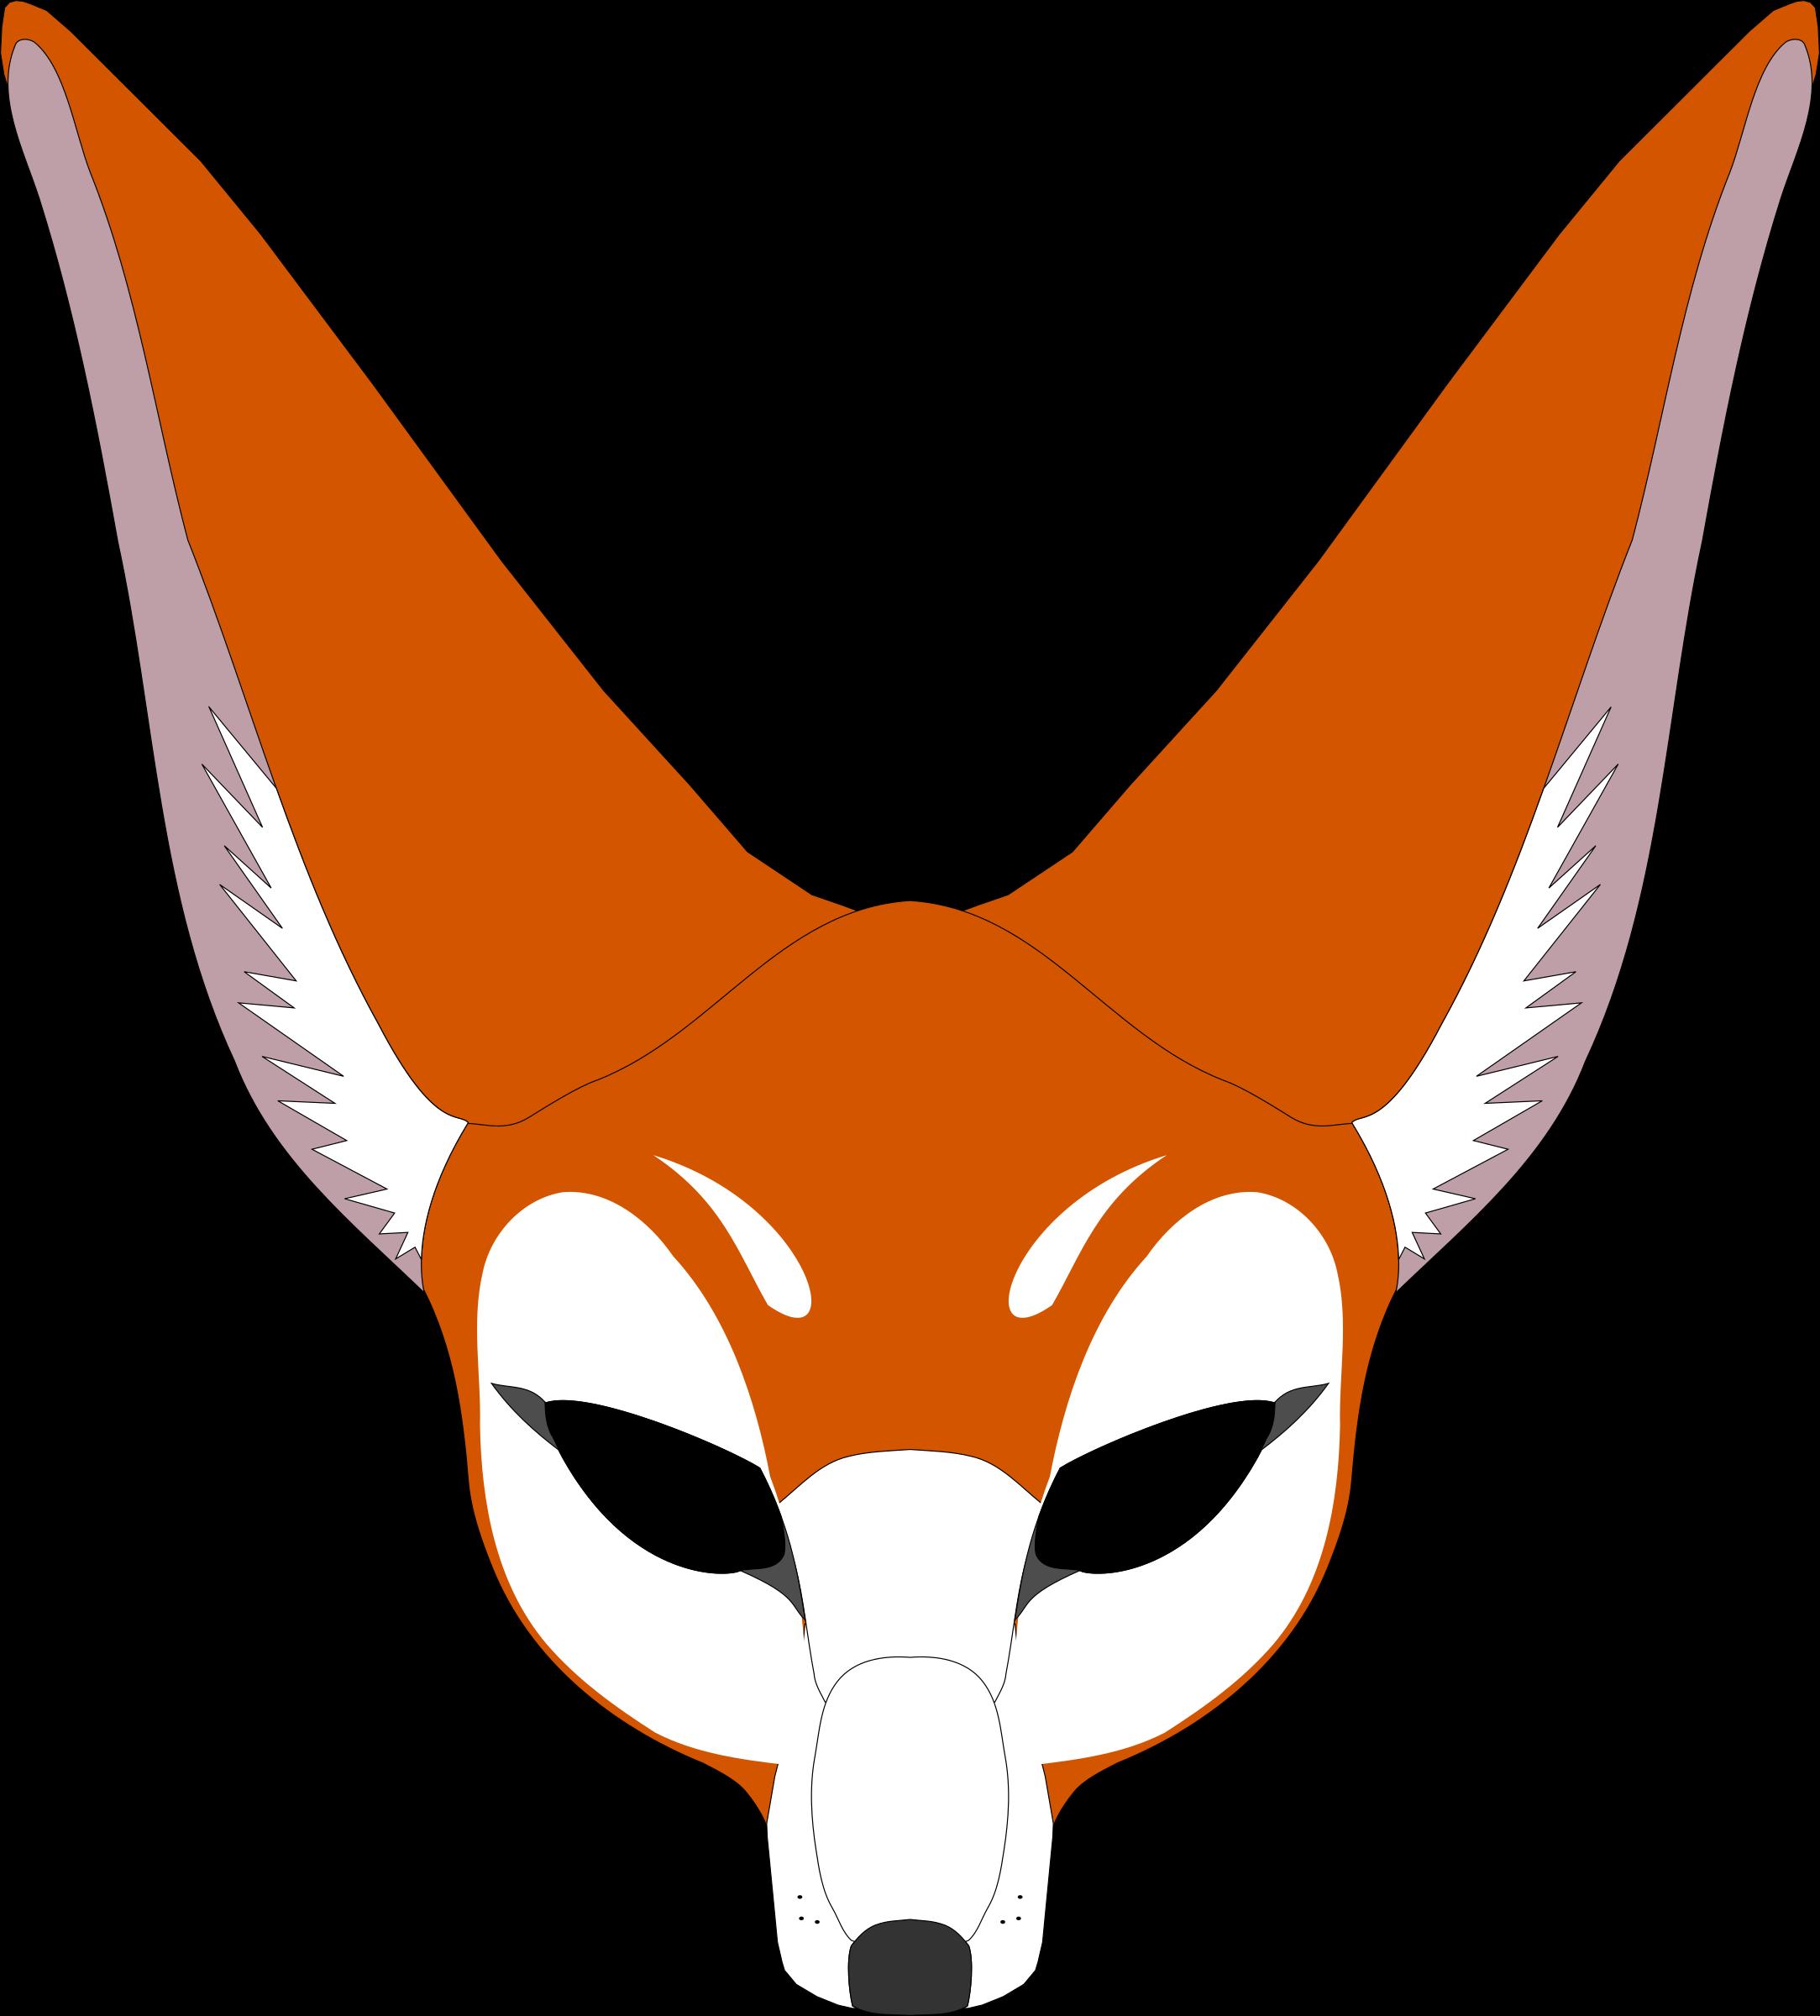 Mask clipart animal. Fox big image png